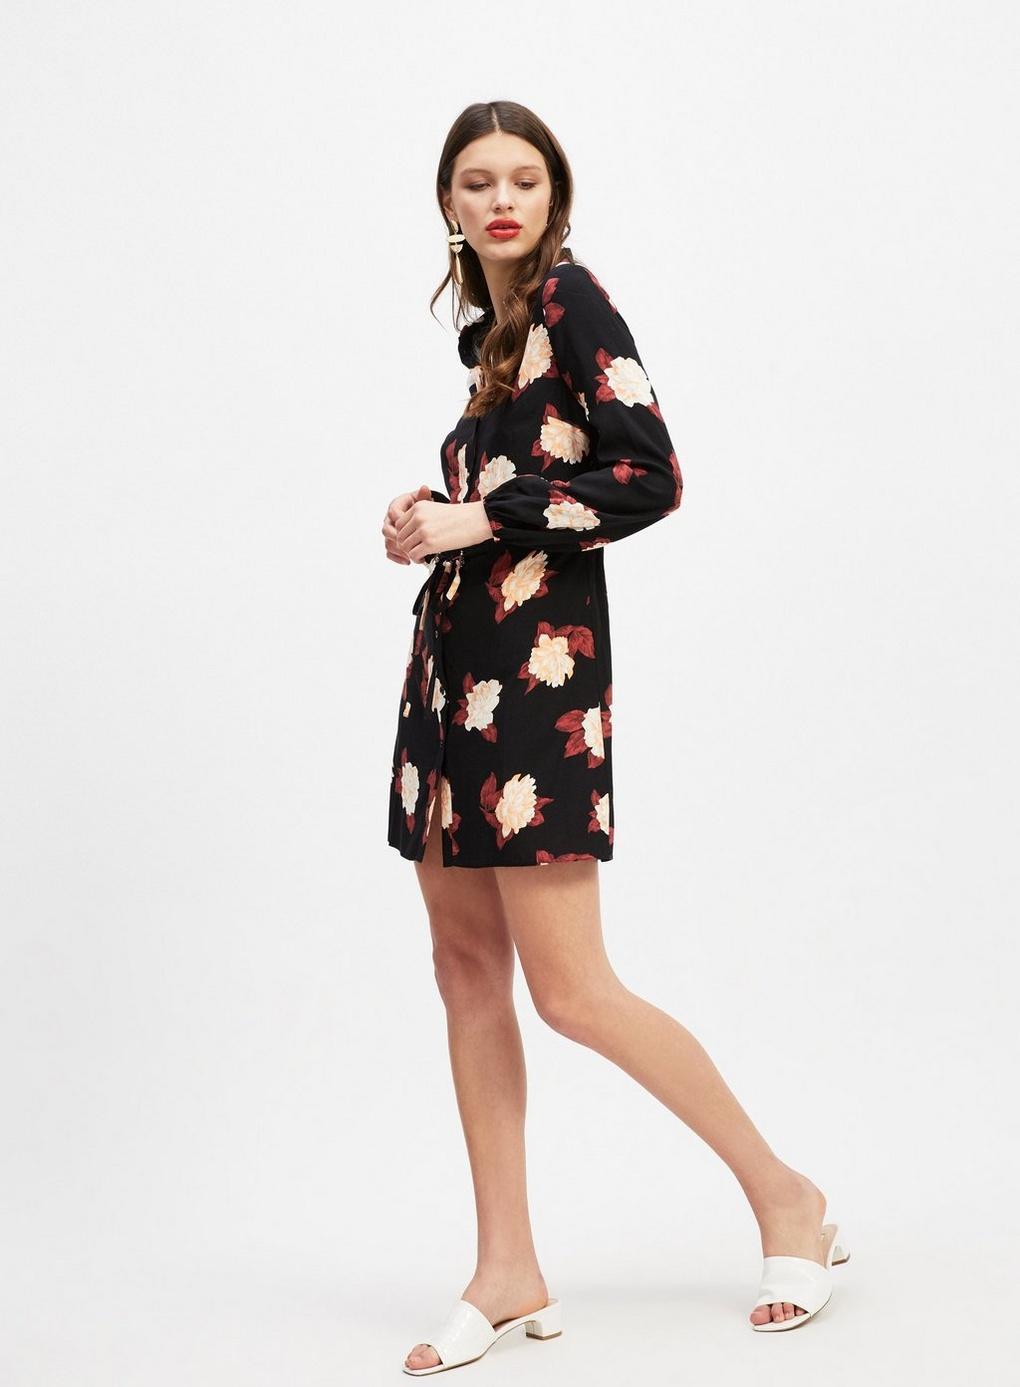 4deb292fe7c Lyst - Miss Selfridge Black Floral Print Mini Shirt Dress in Black